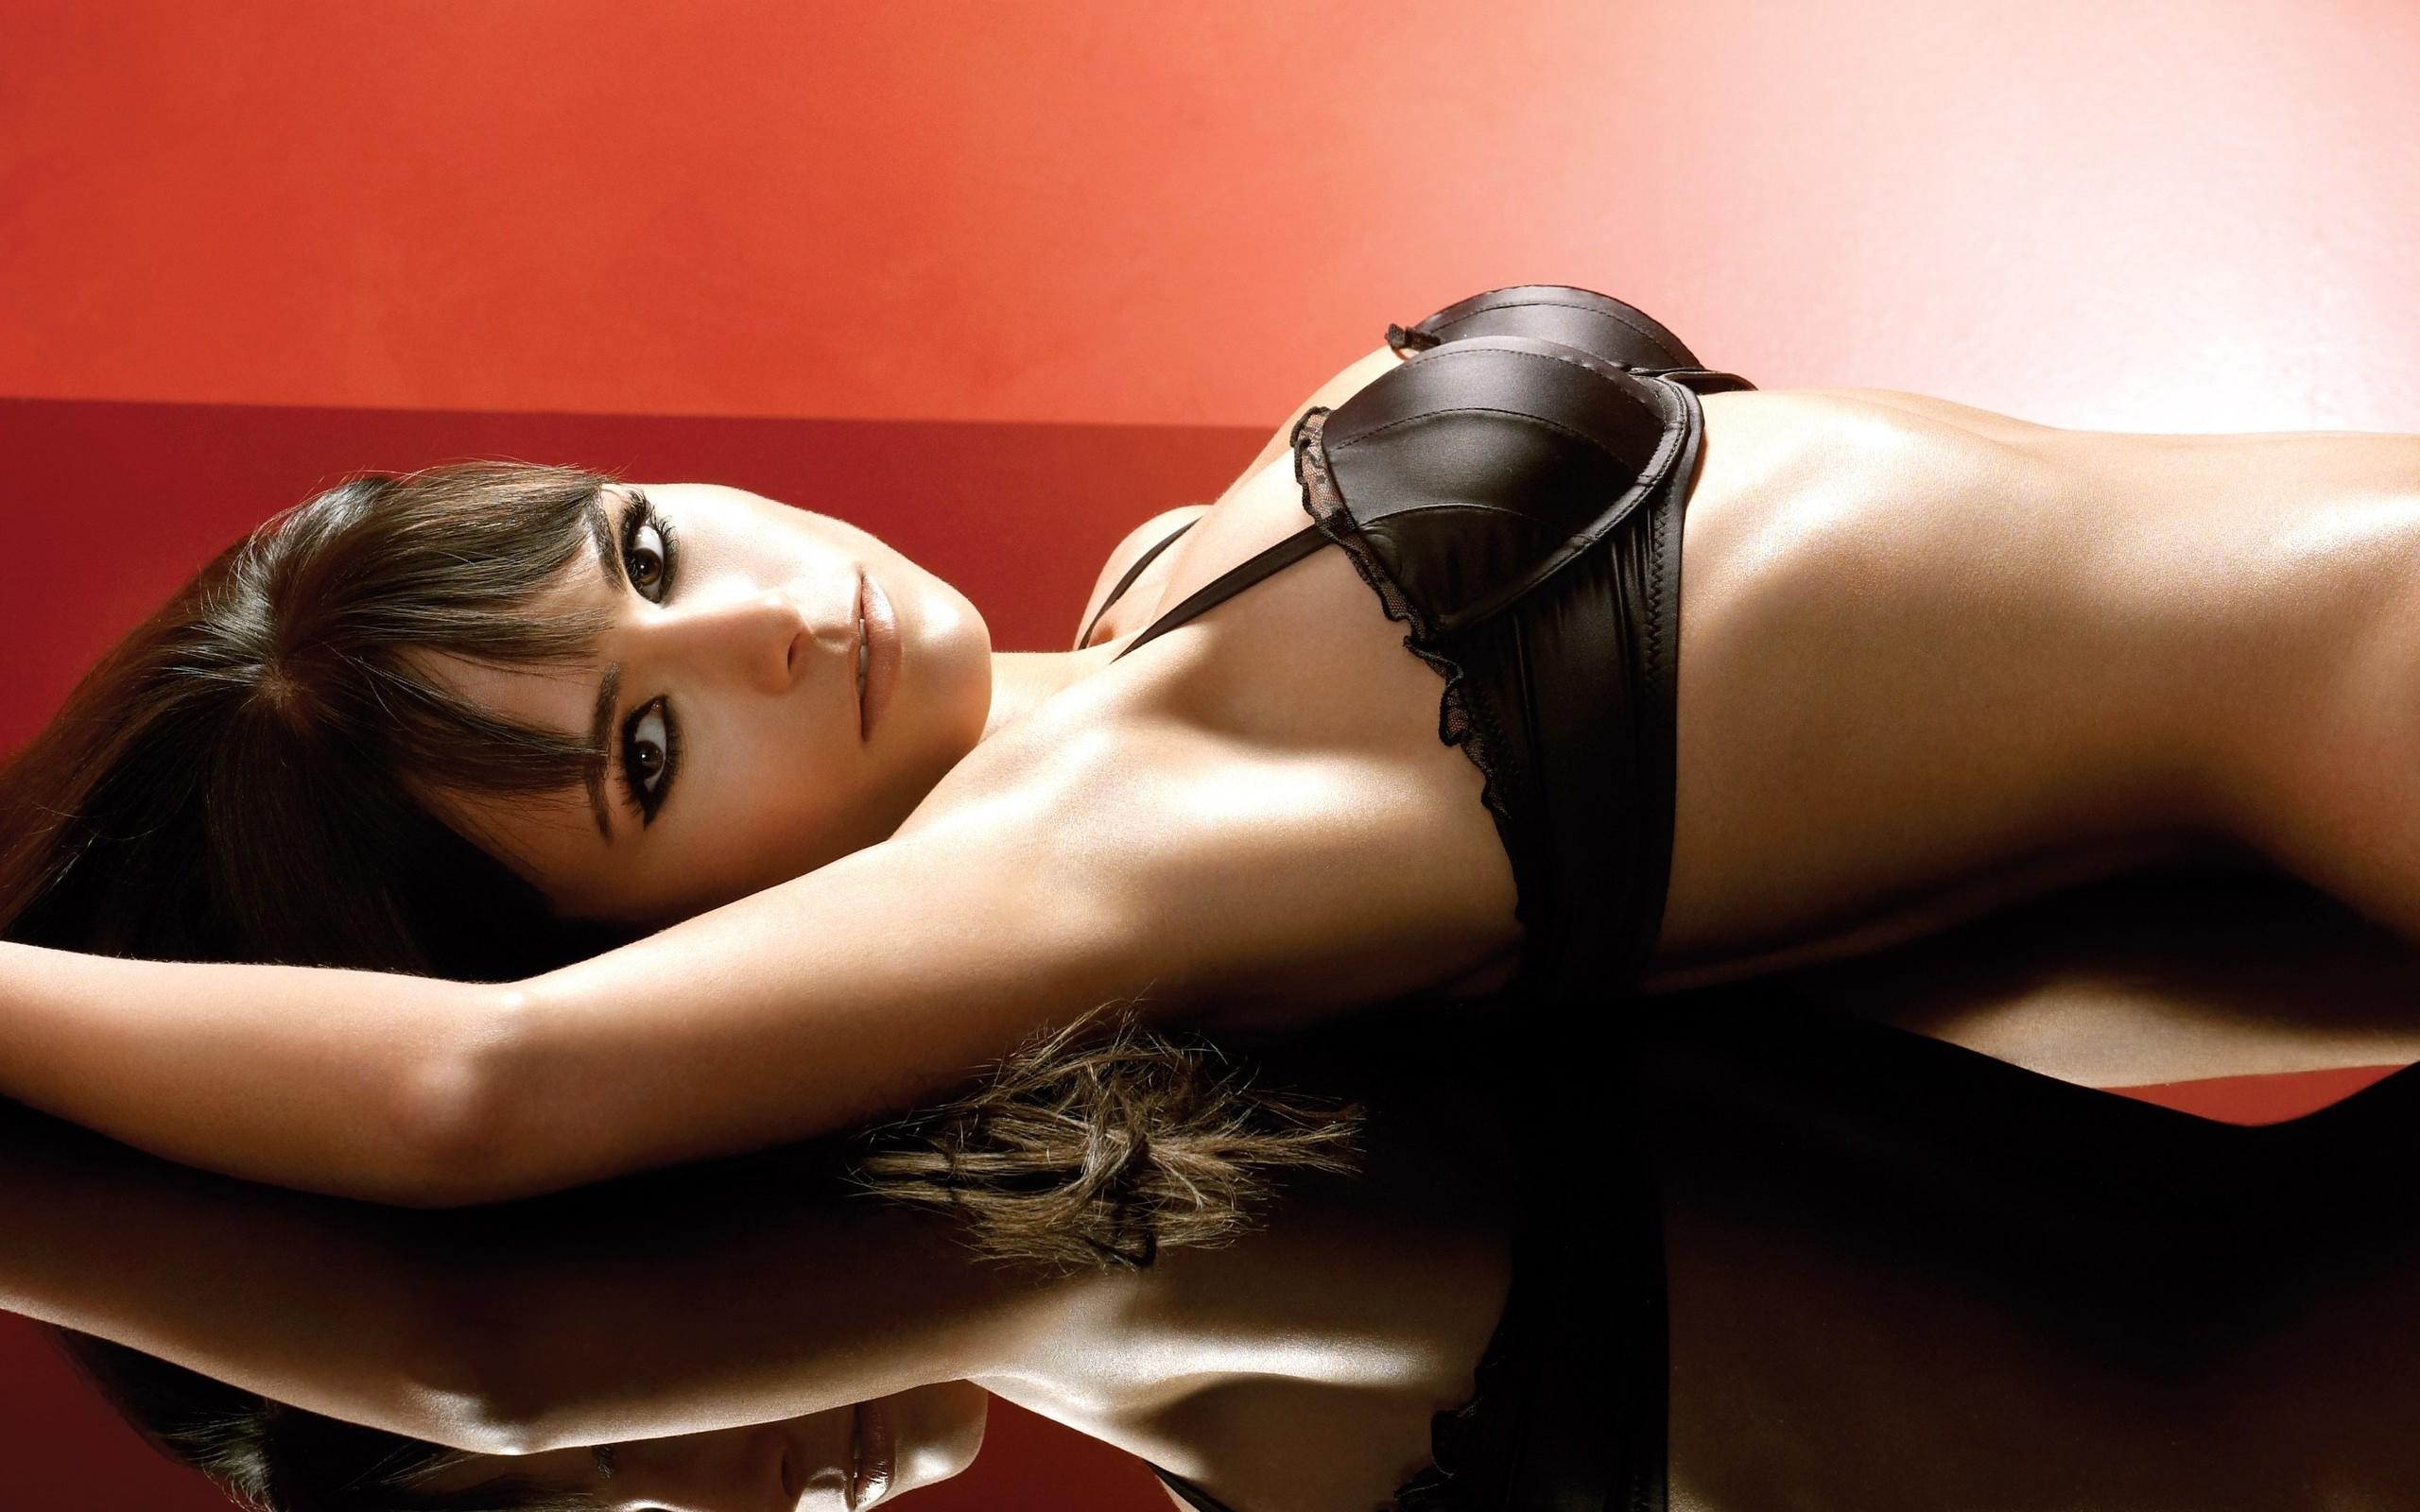 China hot sale seamless gathering cleavage girl sexy beautiful and bra set underwear